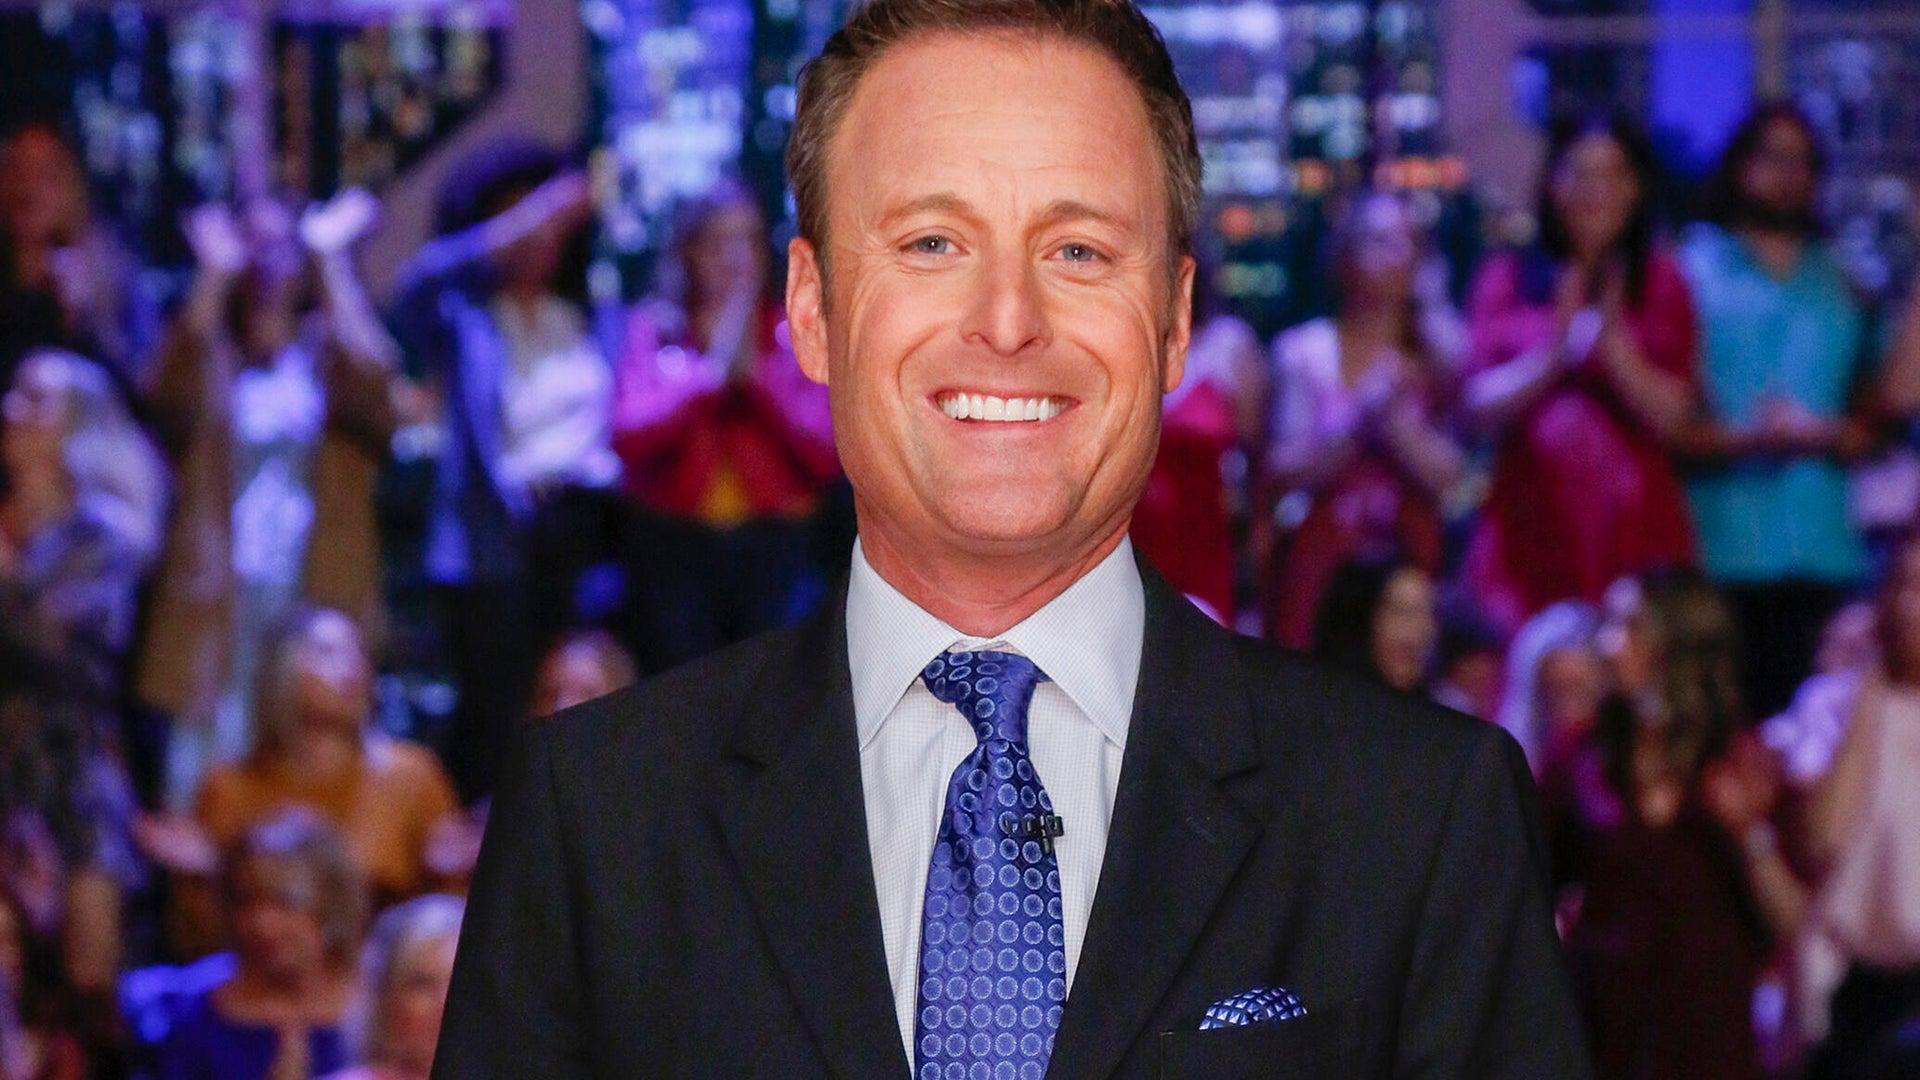 Chris Harrison, The Bachelor